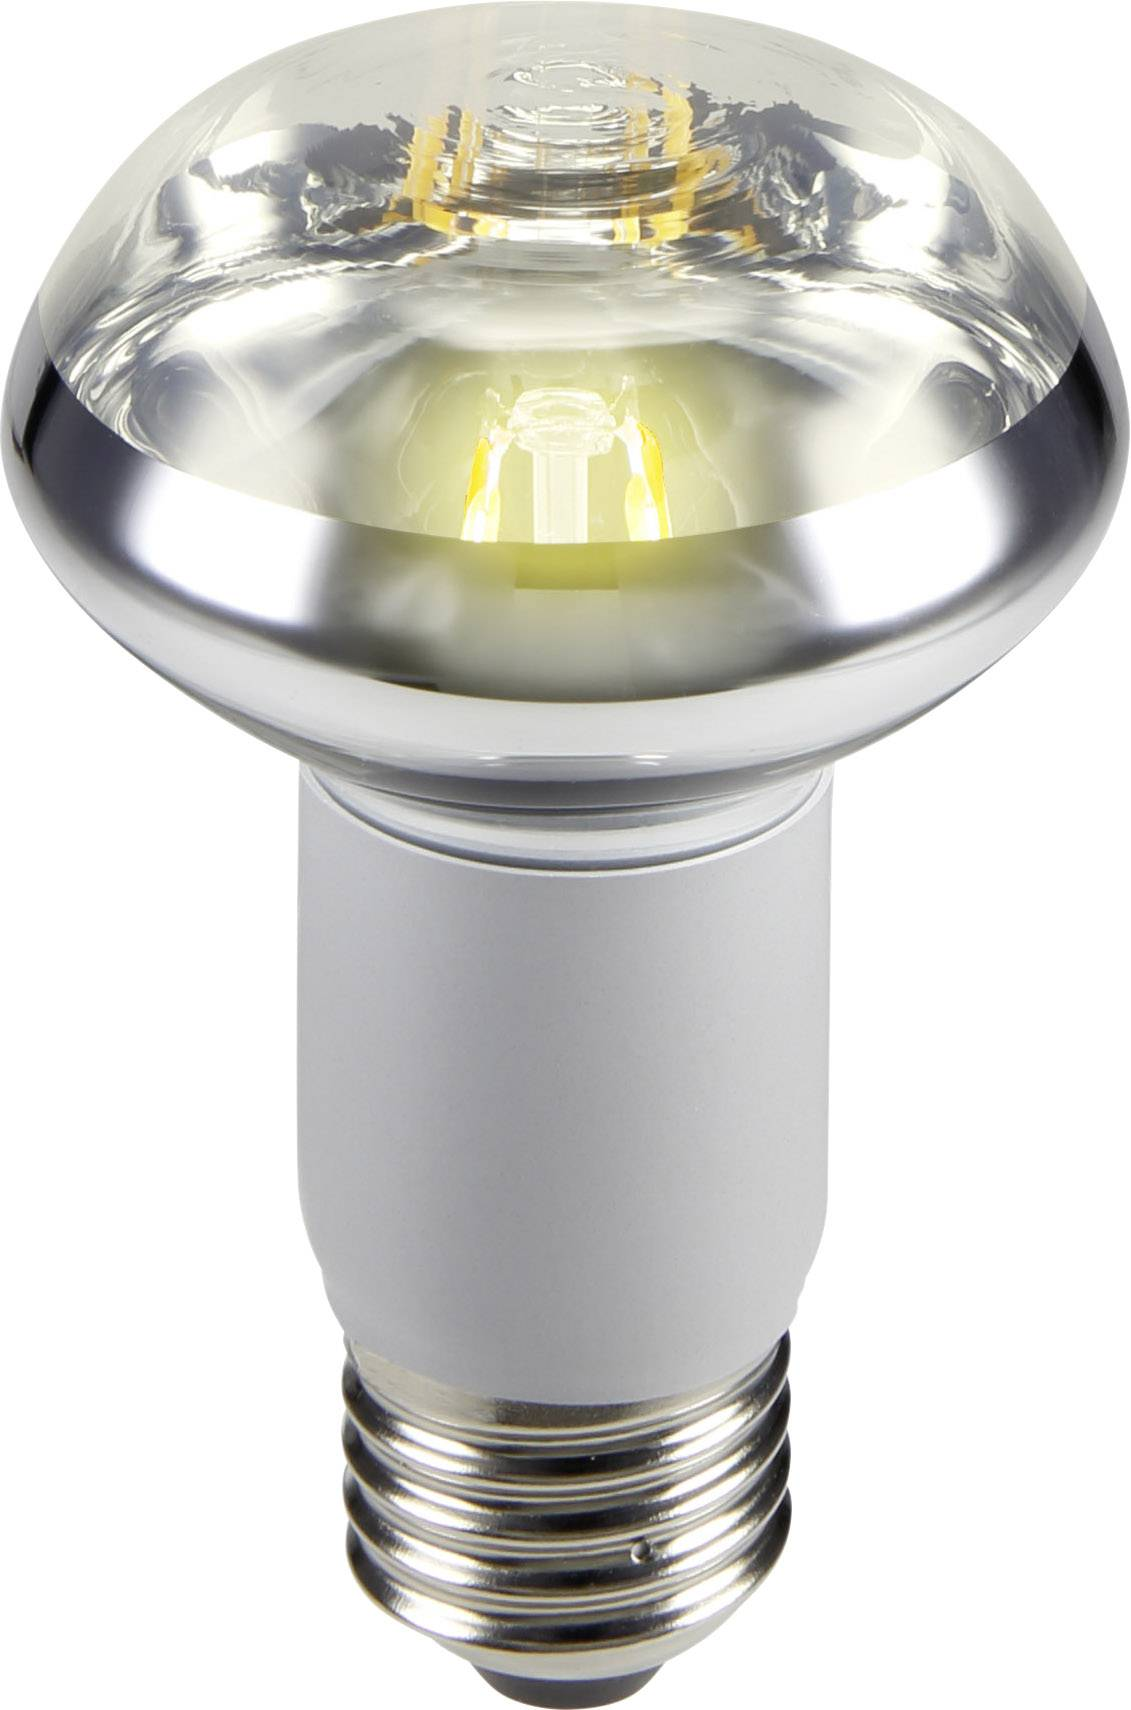 LED žiarovka 100 mm sygonix 230 V 5 W = 47 W vlákno 1 ks